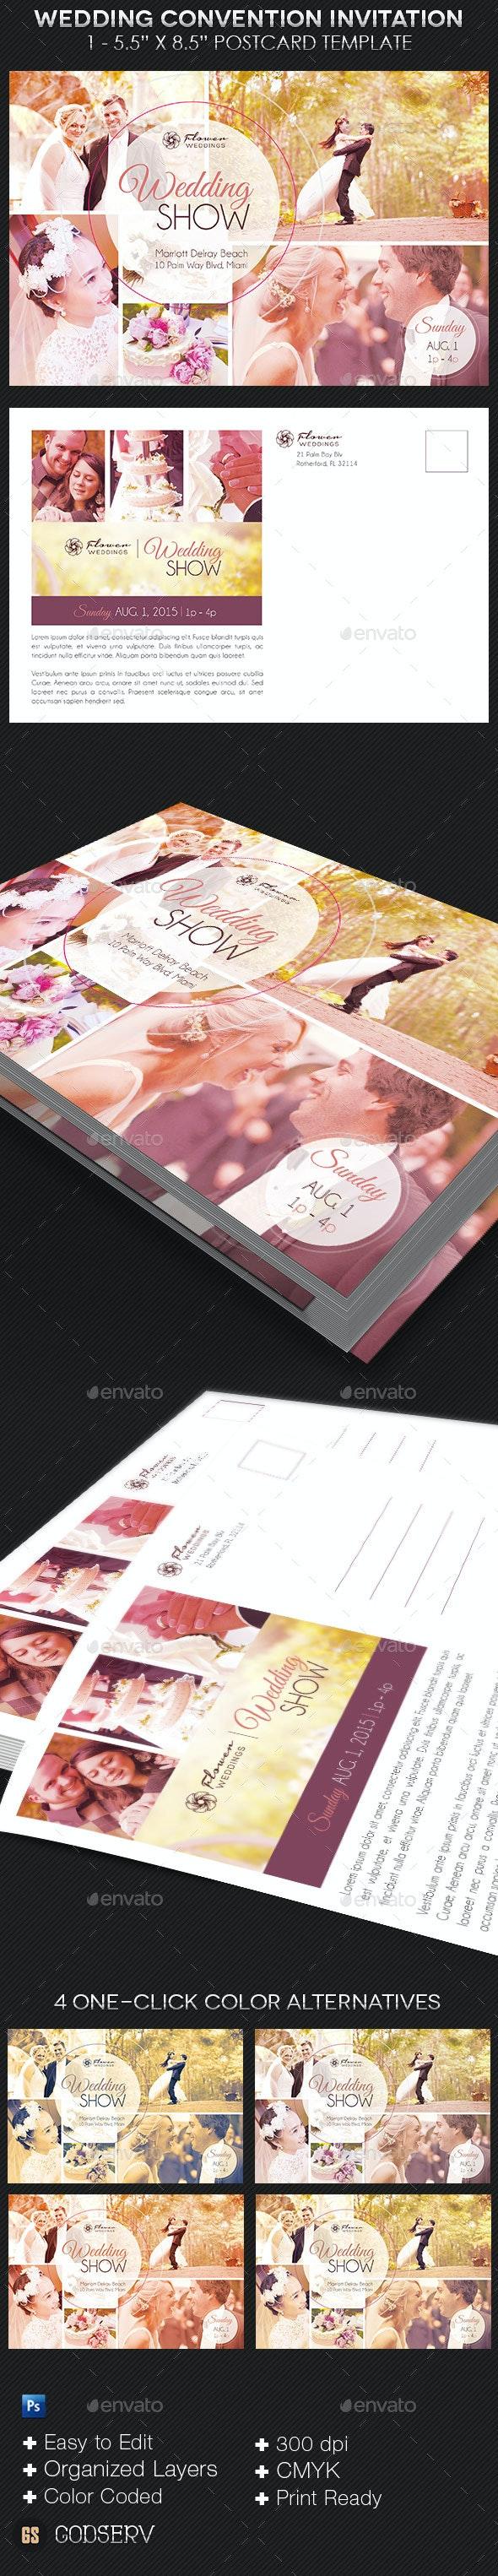 Wedding Convention Invitation Template - Invitations Cards & Invites